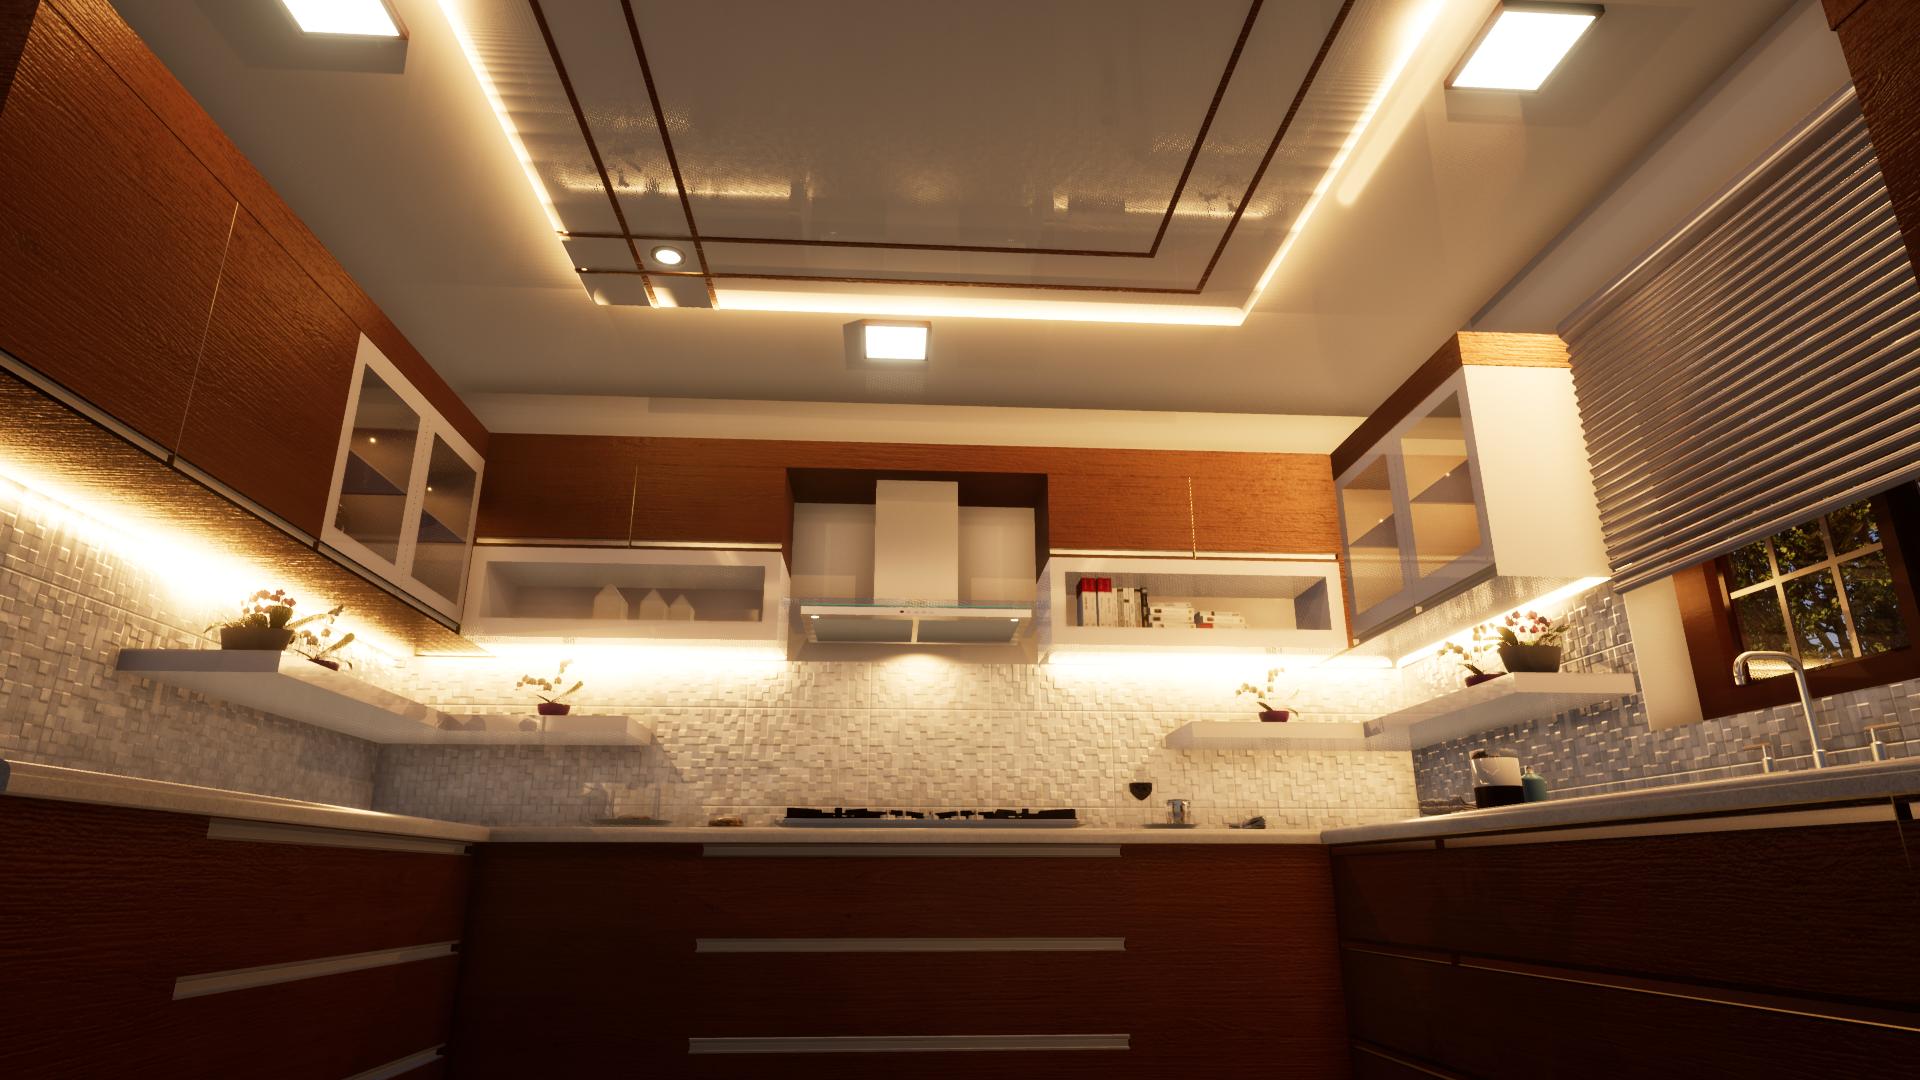 Kitchen design.png